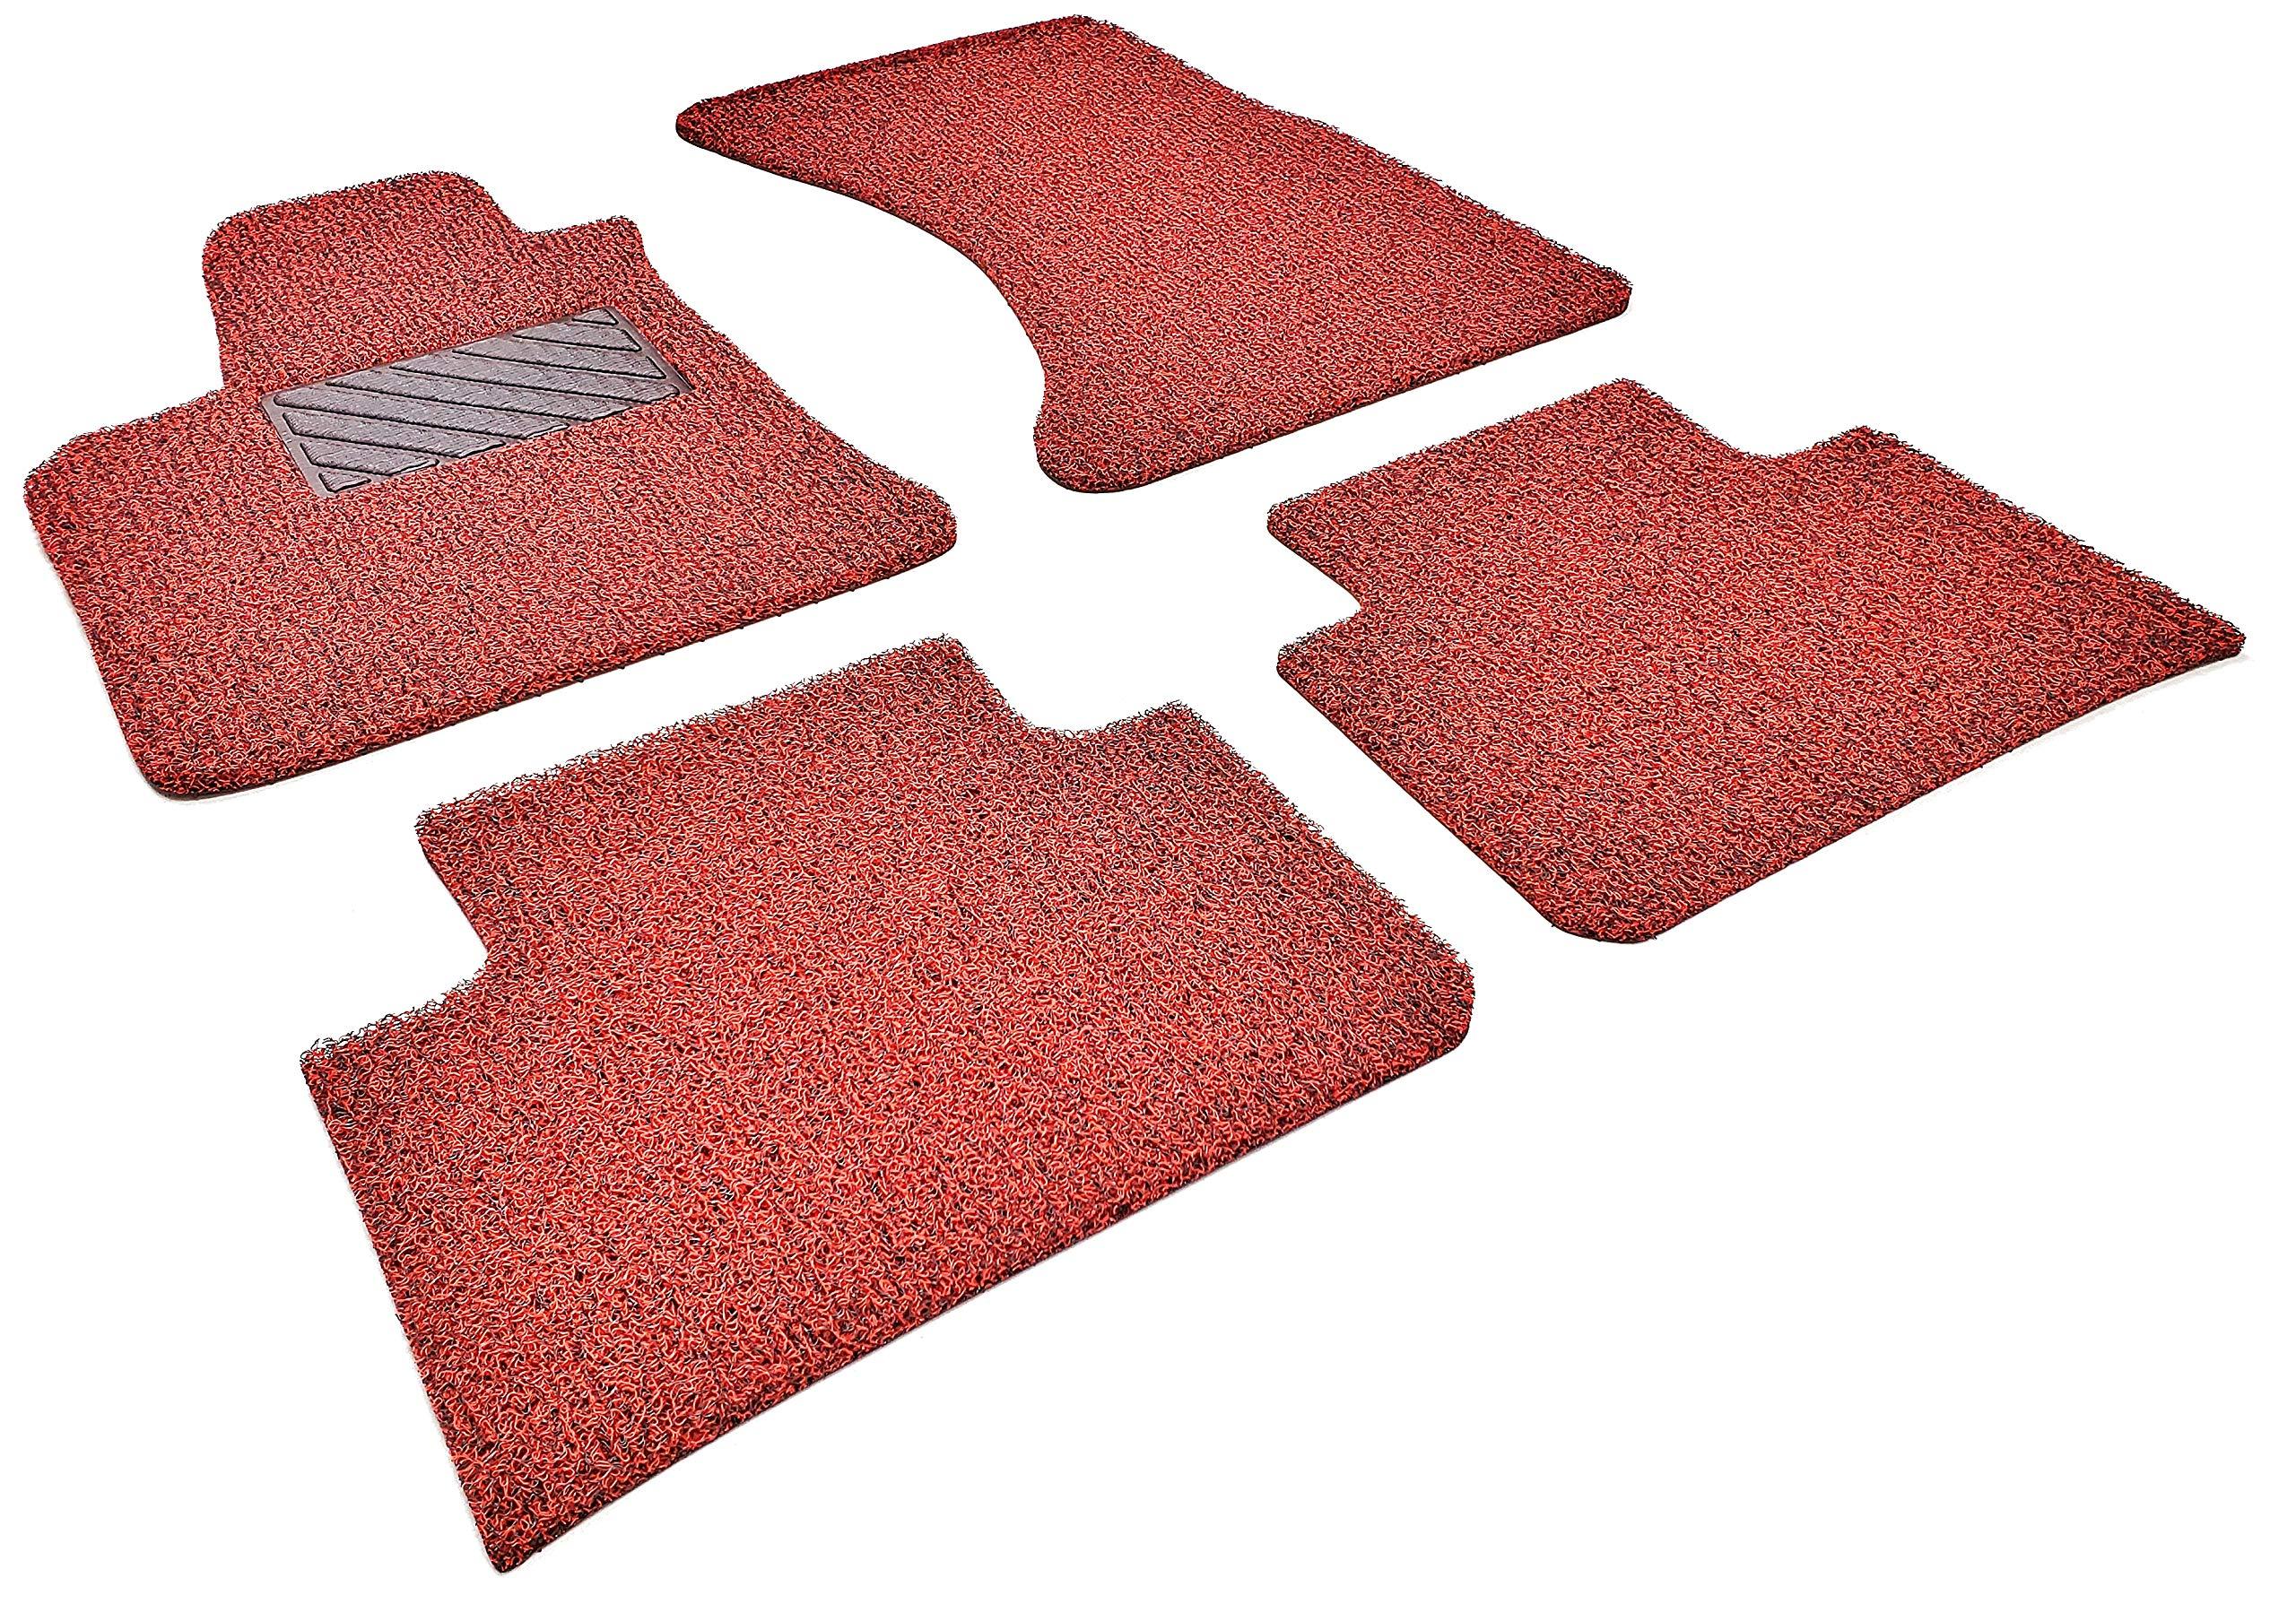 4 Pieces Floor Mat Set Autotech Park Custom Fit Car Floor Mat Compatible with 2015-2017 Chrysler 200 Sedan All Weather Heavy Duty Floor Mat Set